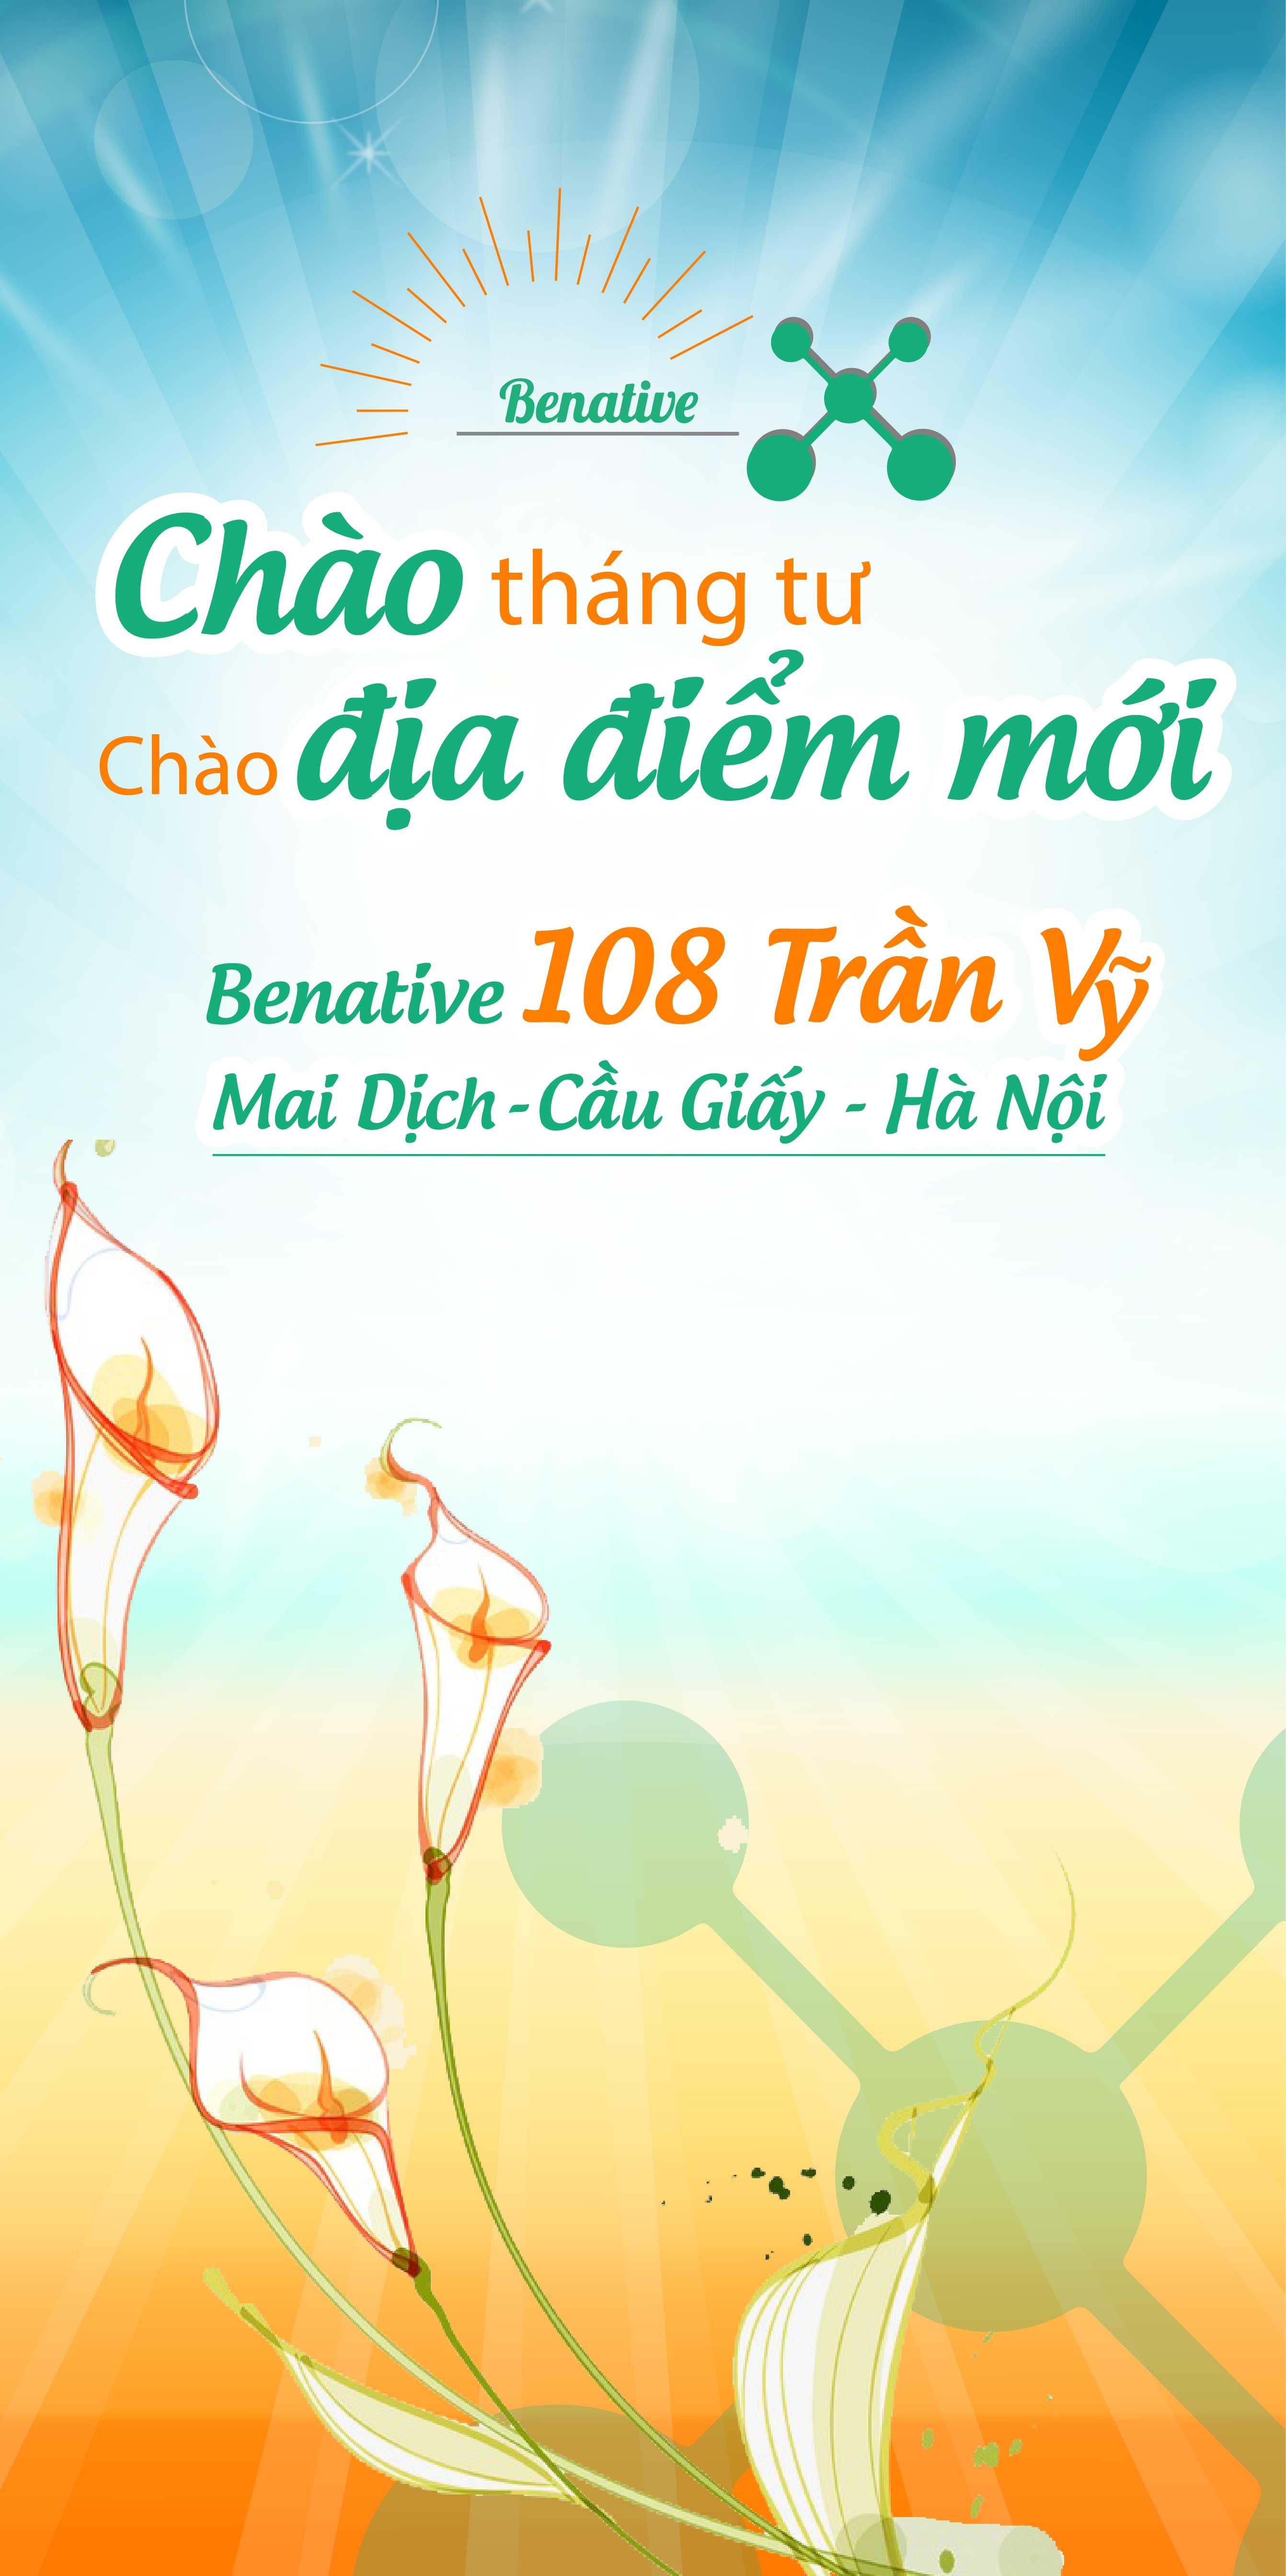 dia chi hoc tieng anh tai benative vietnam